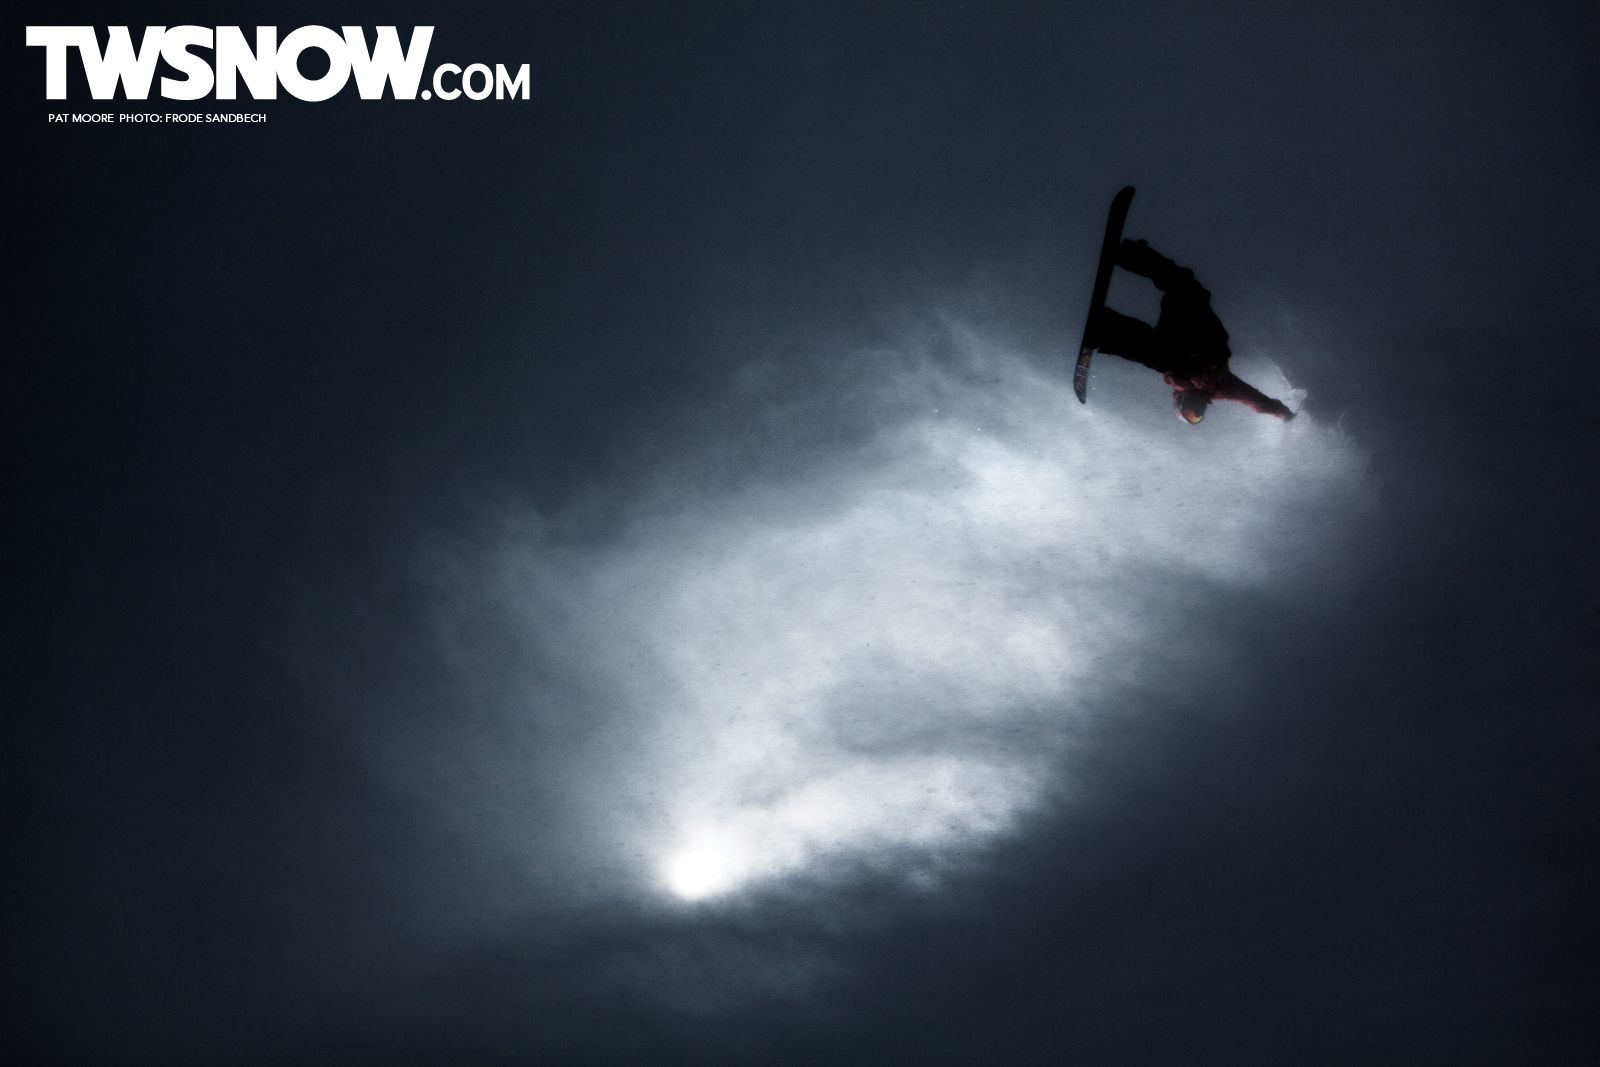 TW Snow - Pat Moore Photo: Frode Sandbech